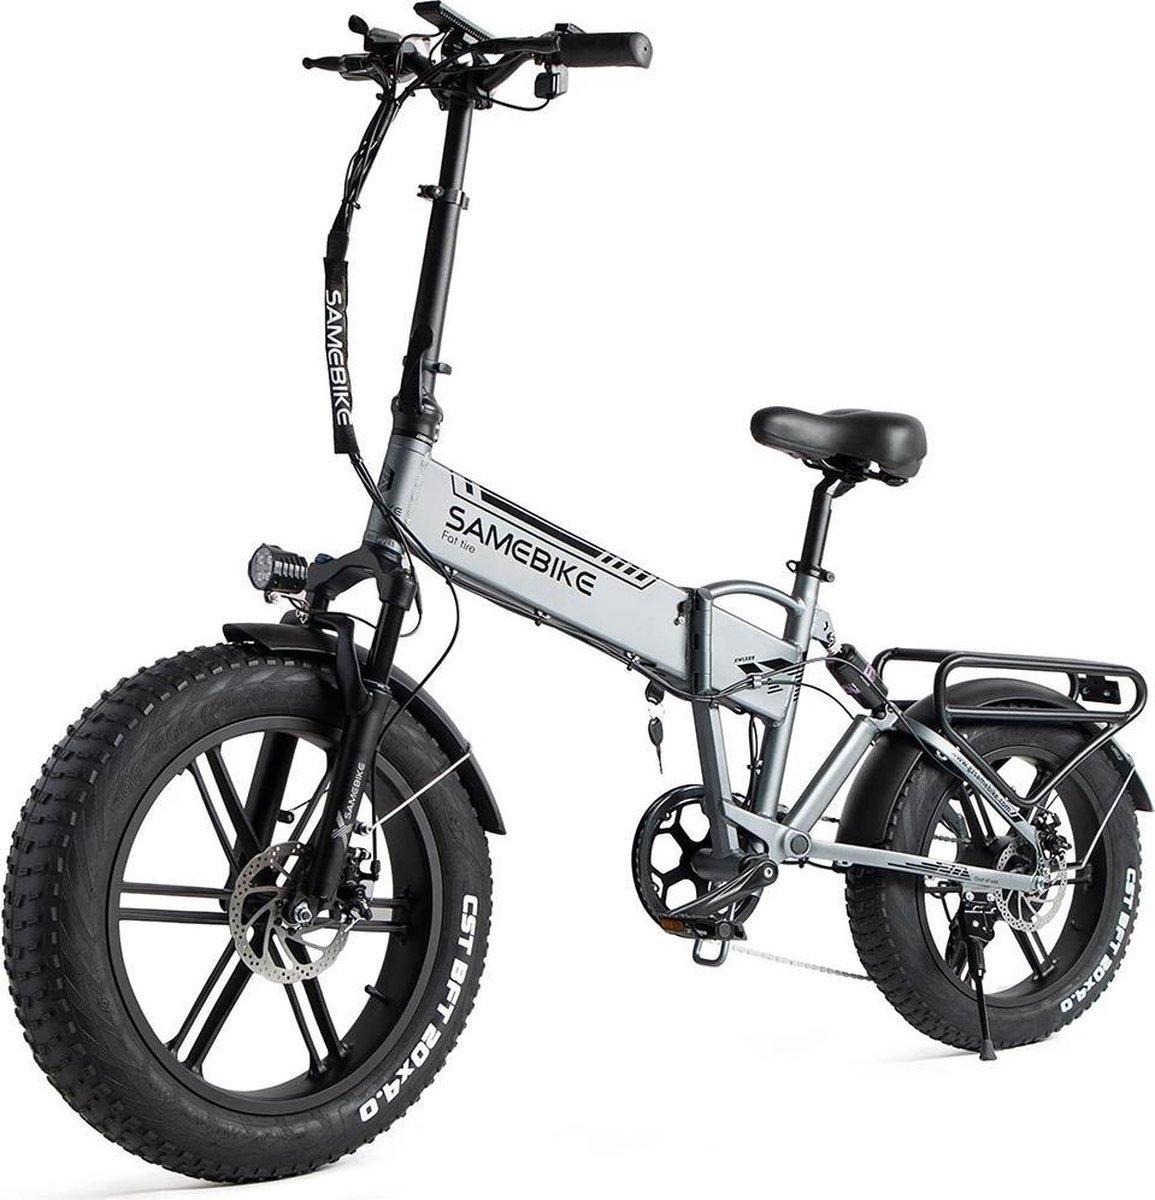 "Elektrische Fiets - Elektrische Fatbike - 500W 20 "" - 4.0 Fat tire Motor 48V 15A - Vouwfiets Compact"